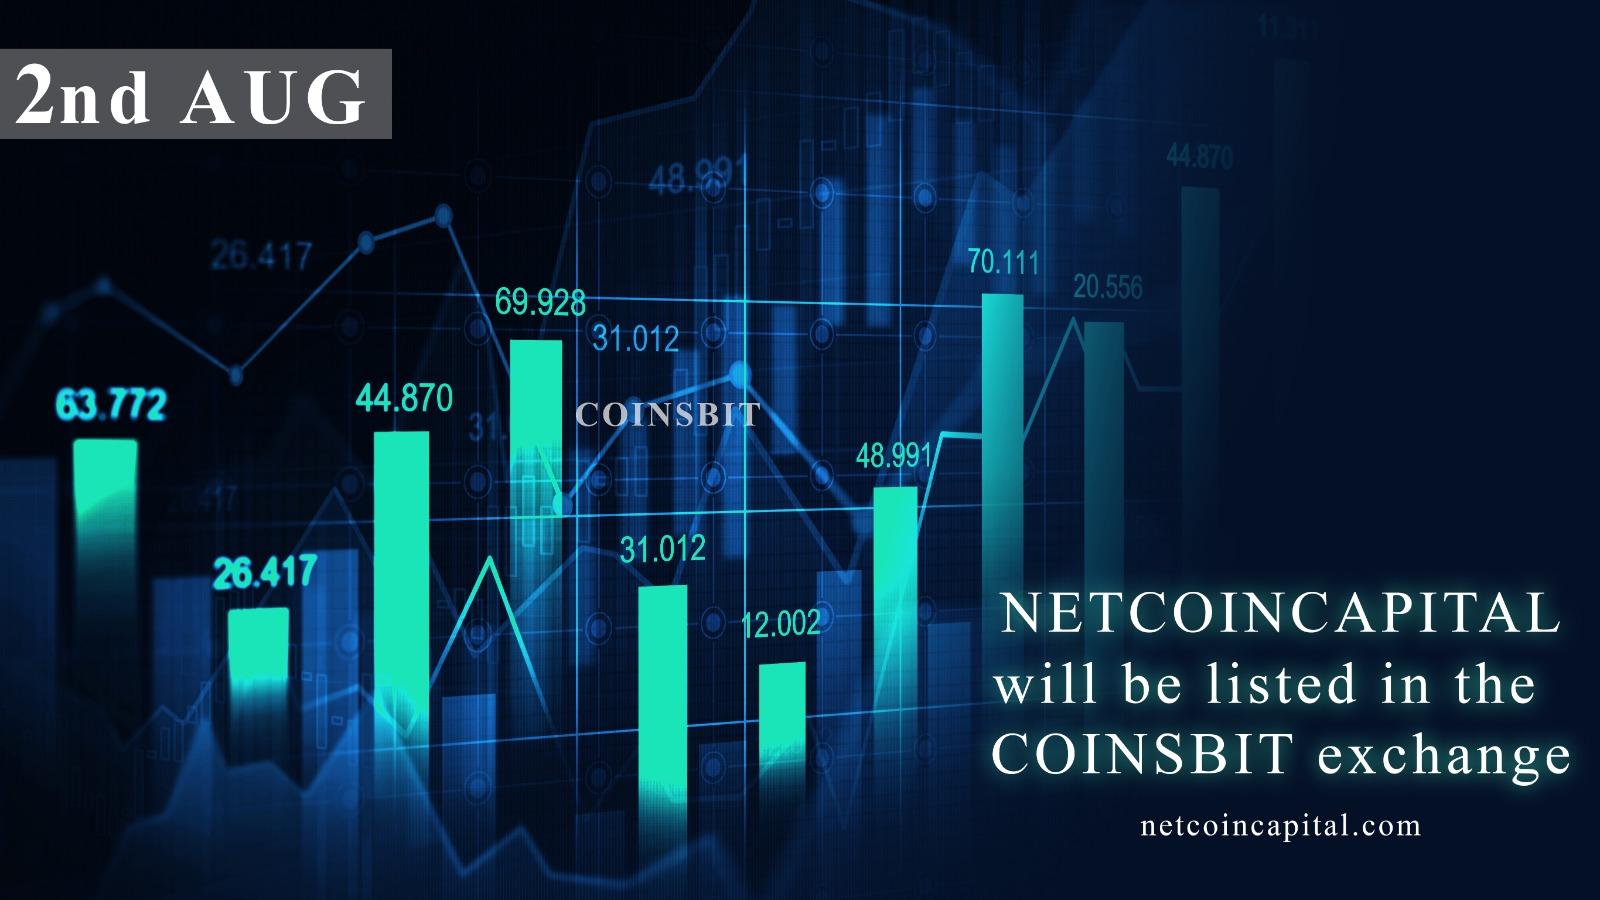 NetcoinCapital Announces to Make Their Token Tradable on Coinsbit Exchange